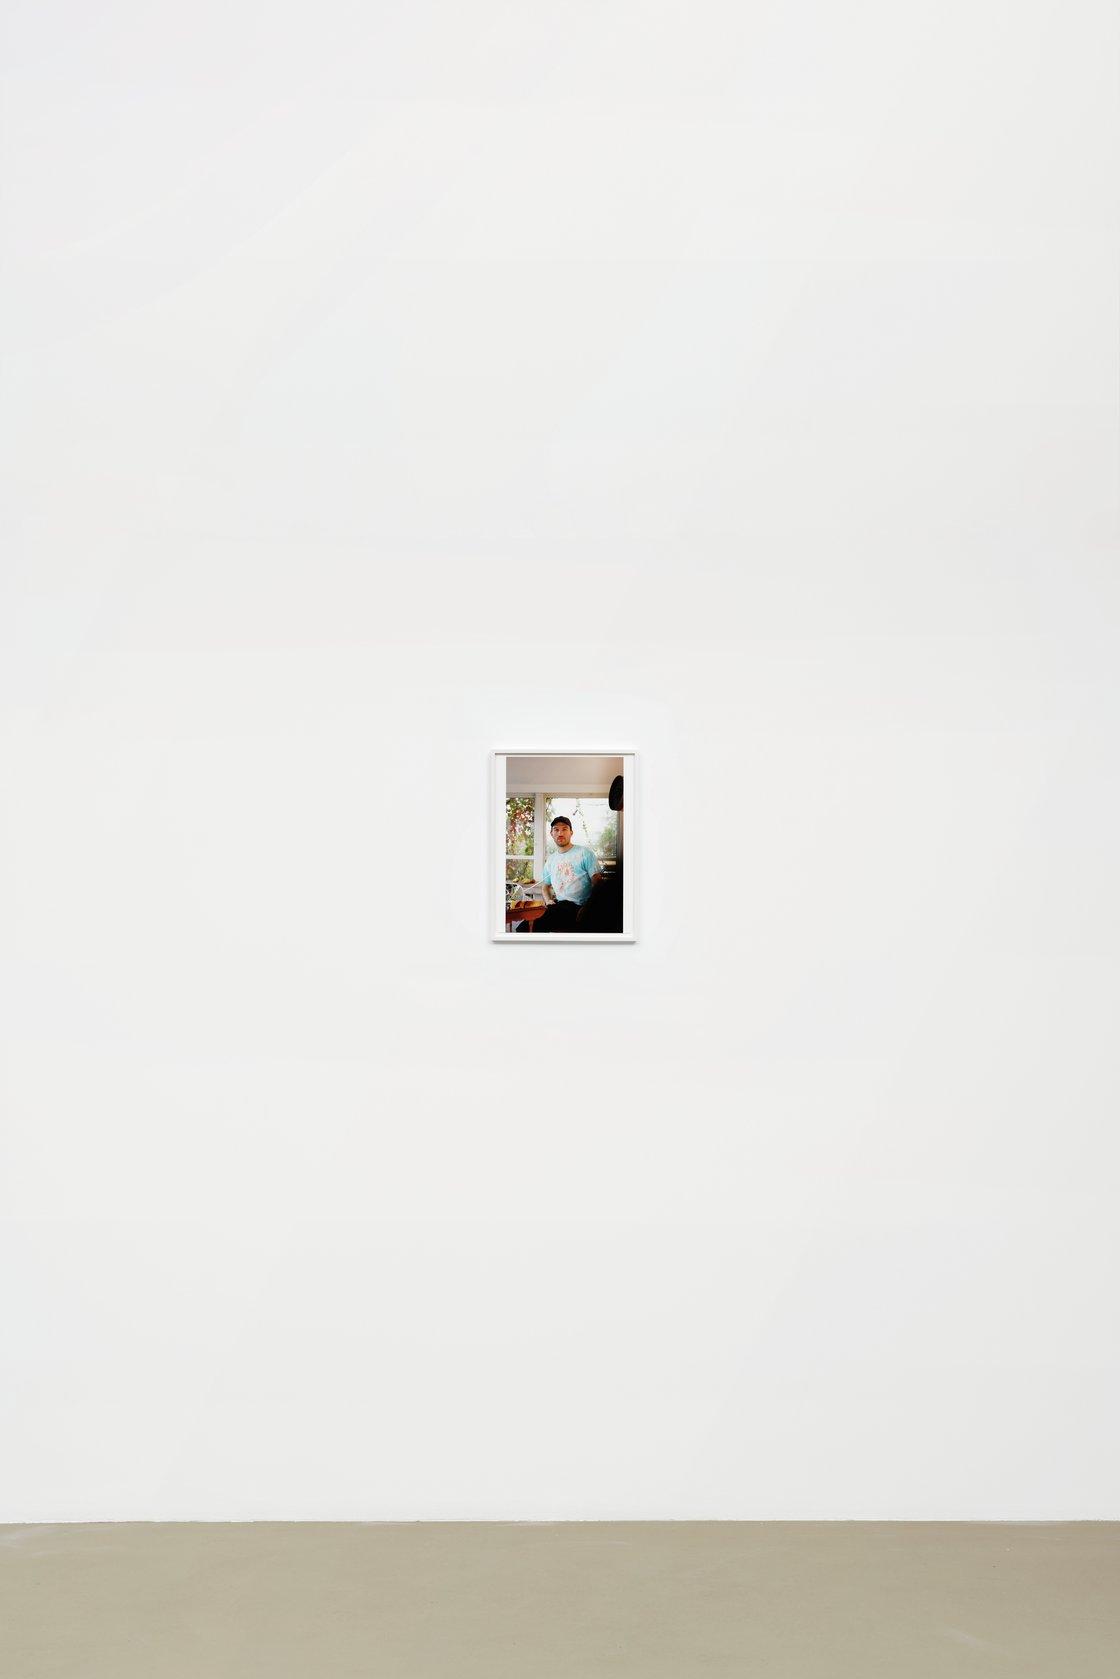 Wolfgang Tillmans, Dan in glass house, 2020